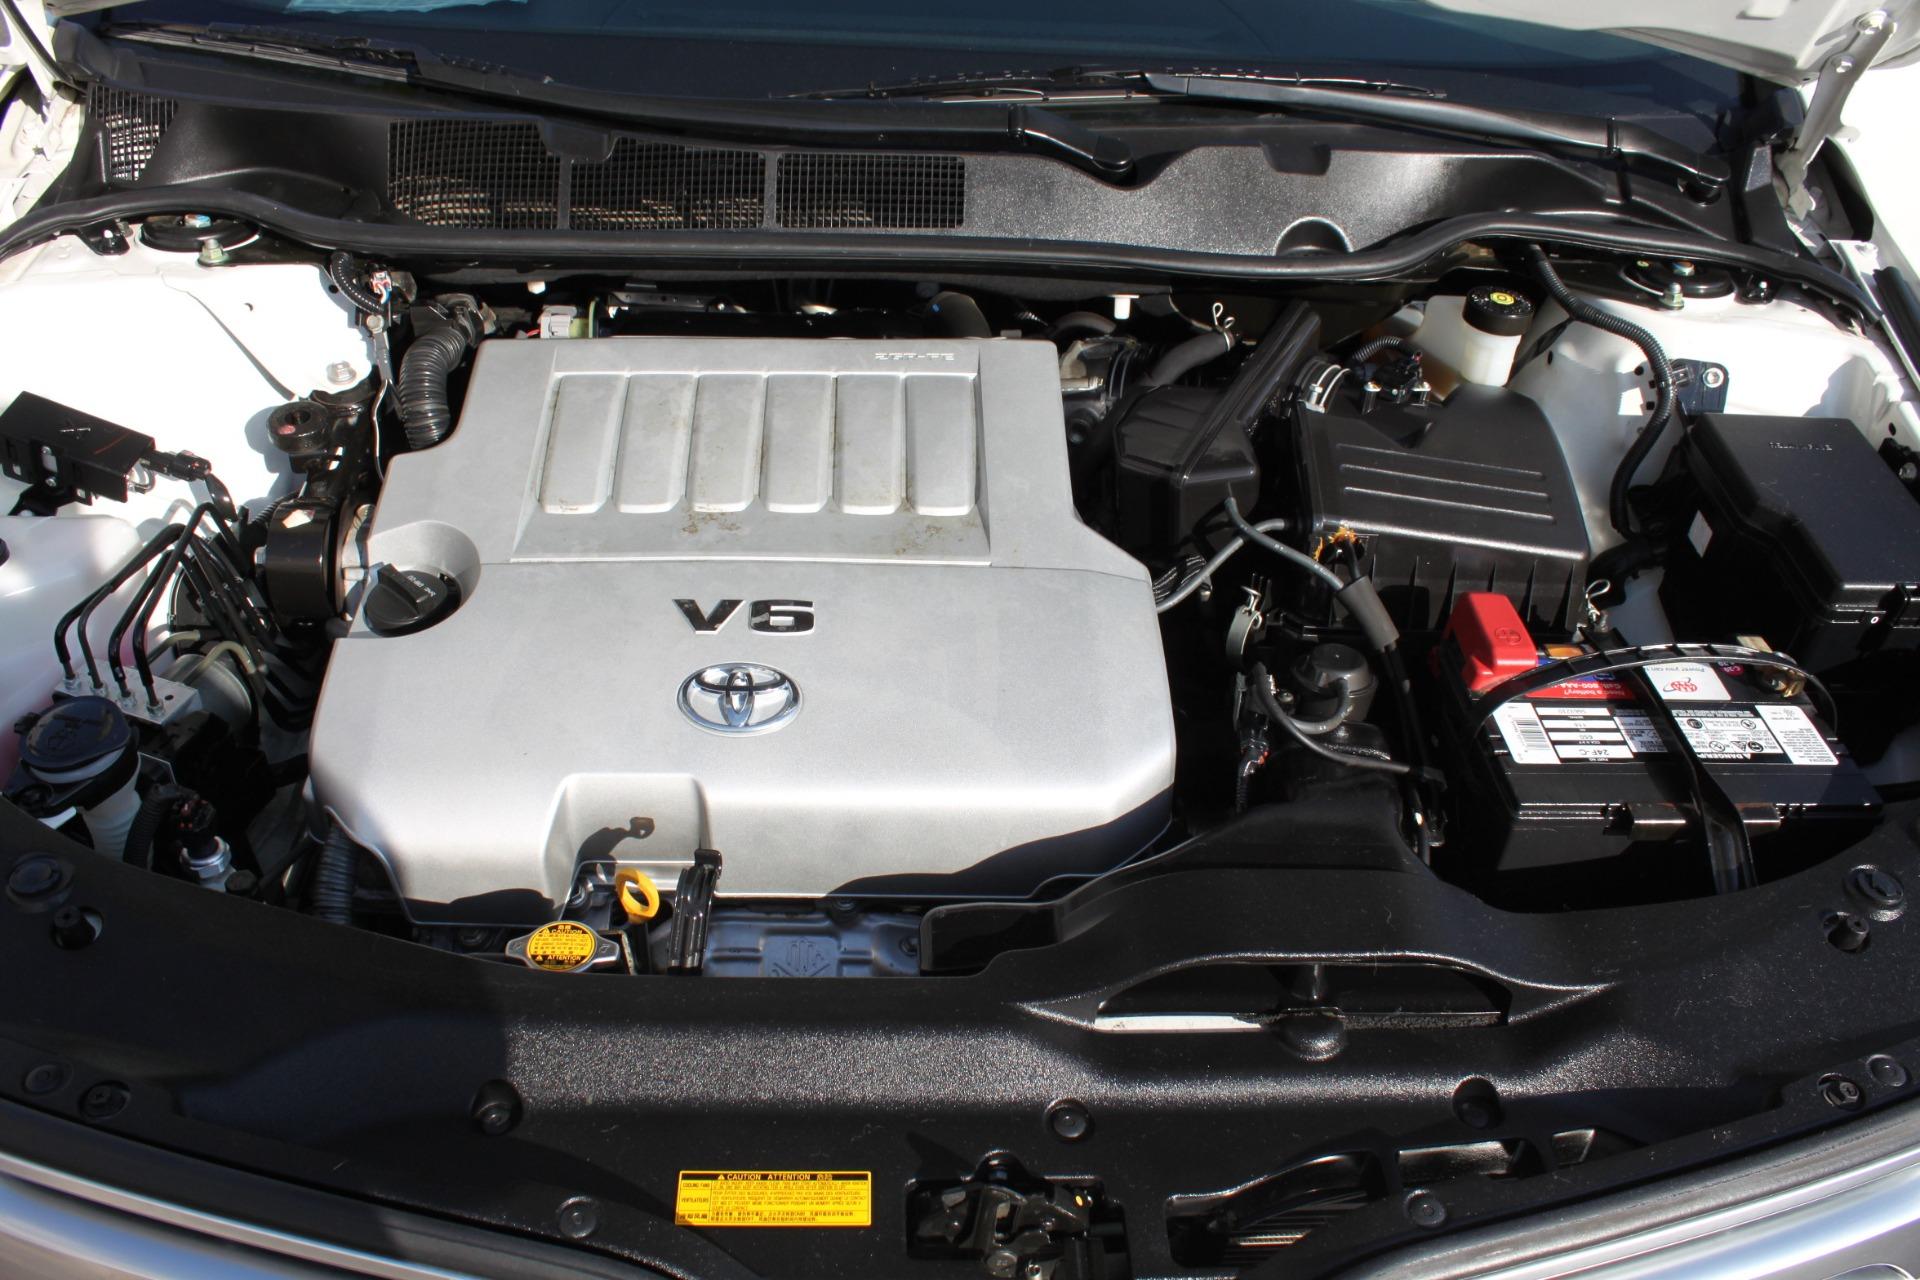 Used-2012-Toyota-Venza-XLE-Dodge